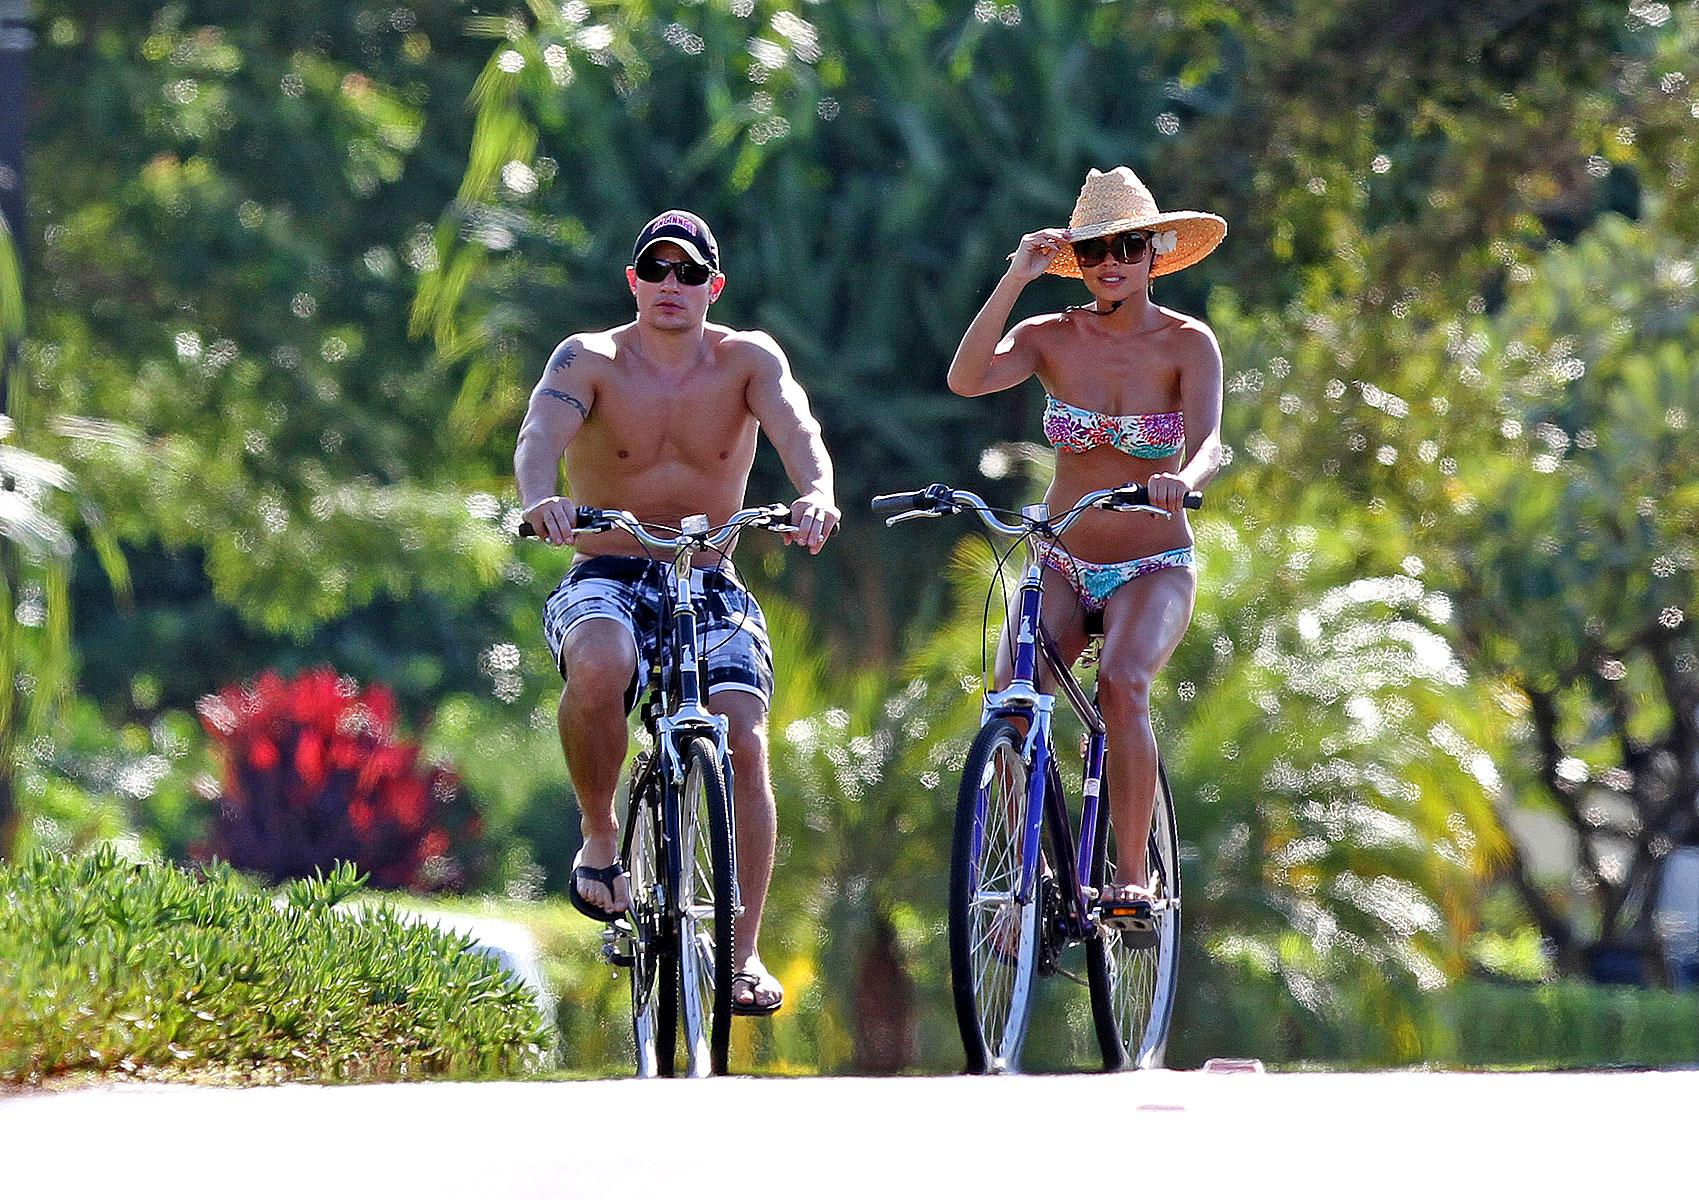 Vanessa Minnillo Bikini Candids on a Bike in Hawaii